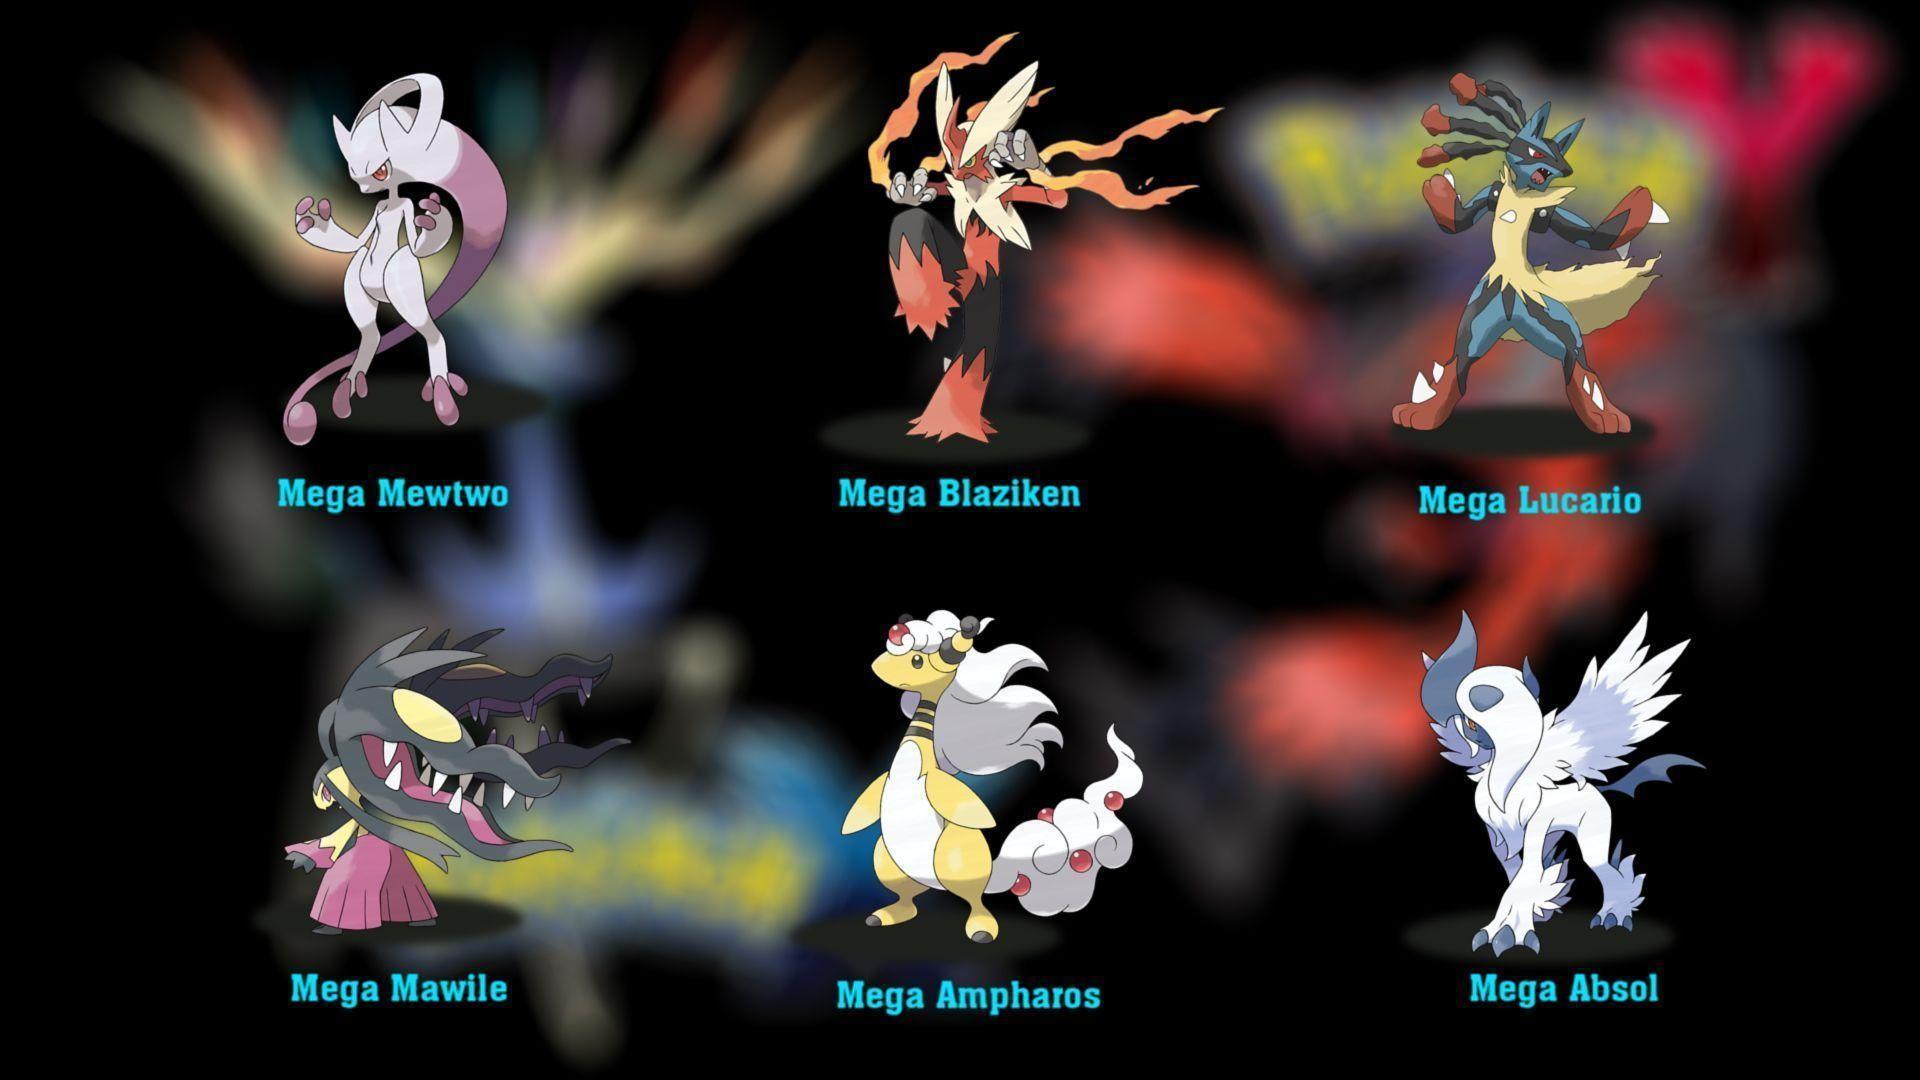 1920x1080 Pokemon Mega Evolution Wallpaper